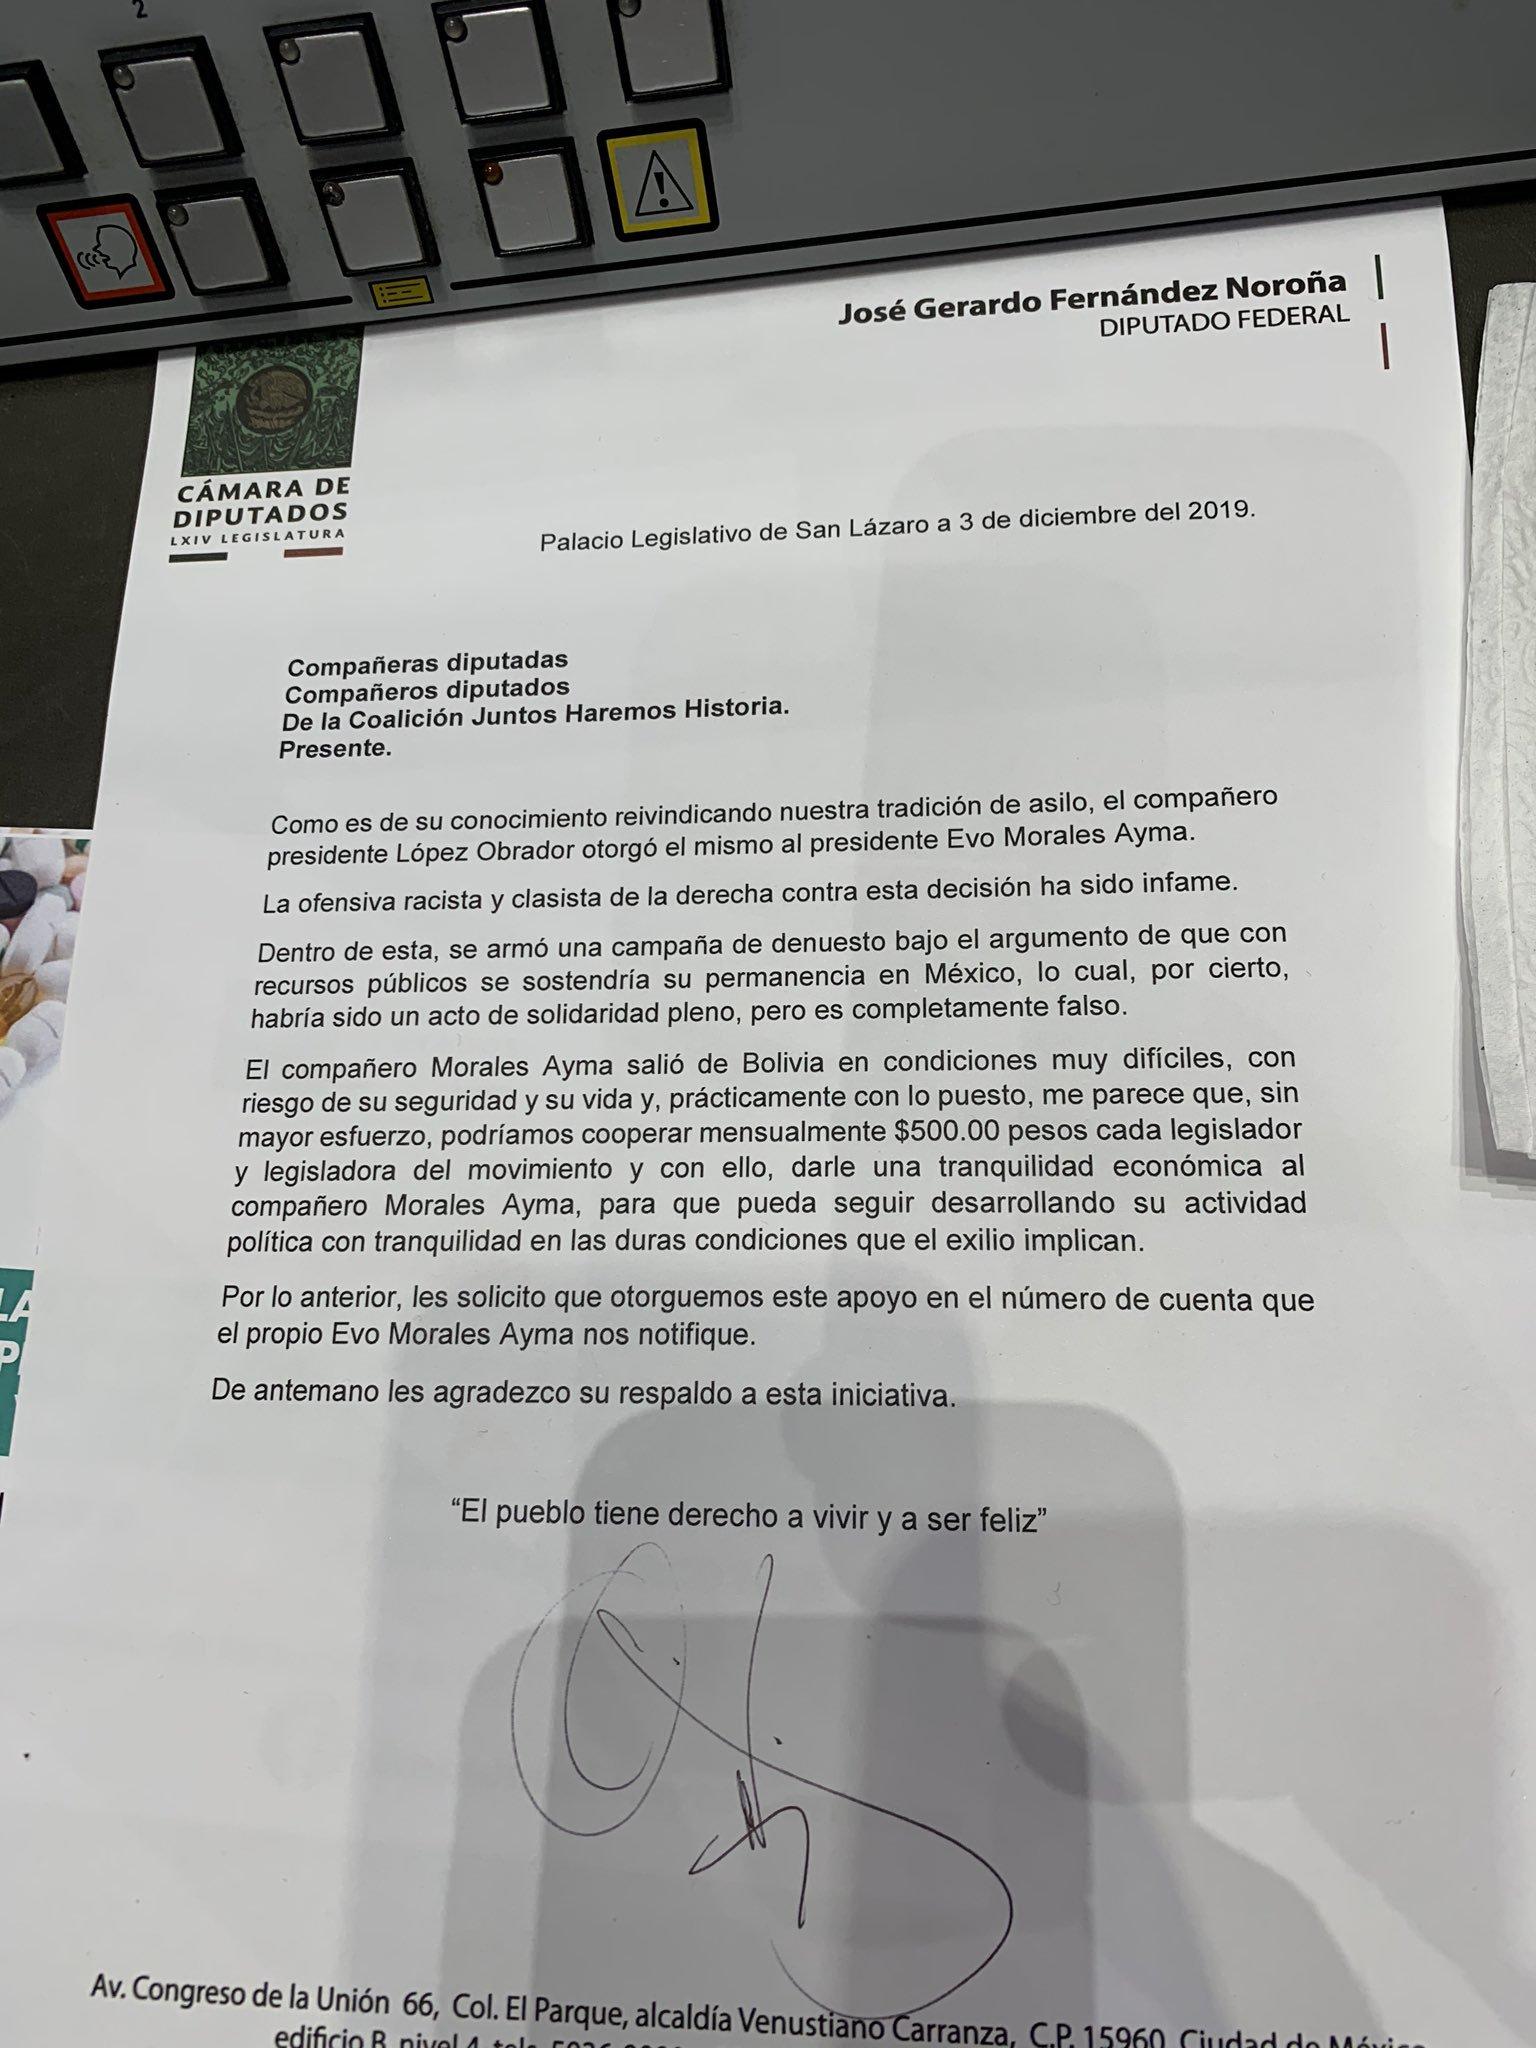 fernandez-norona-carta-oficial-formal-cooperacion-500-pesos-evo-morales-02